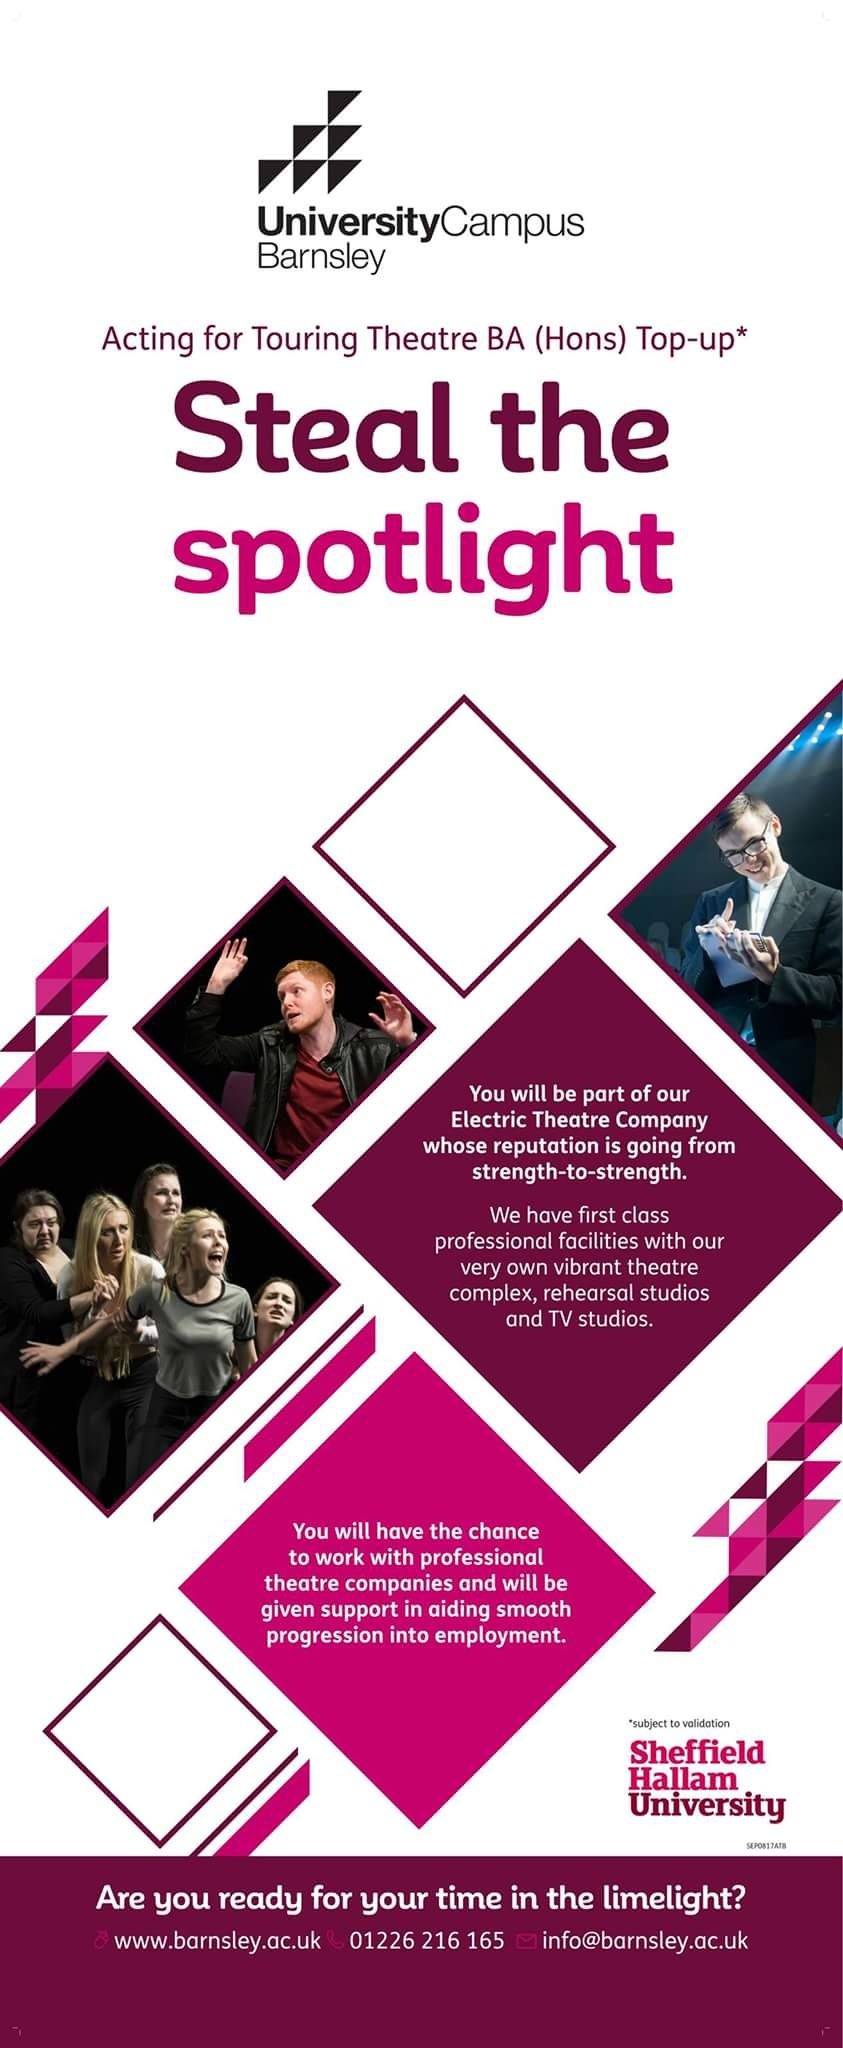 Best drama schools in uk top 15 acting in london httpsuploadsdisquscdnimages649312ebafa4d7e9d8793ce248c6e3f3ea4e187bf762b7d17608f3f576a0f508g fandeluxe Gallery